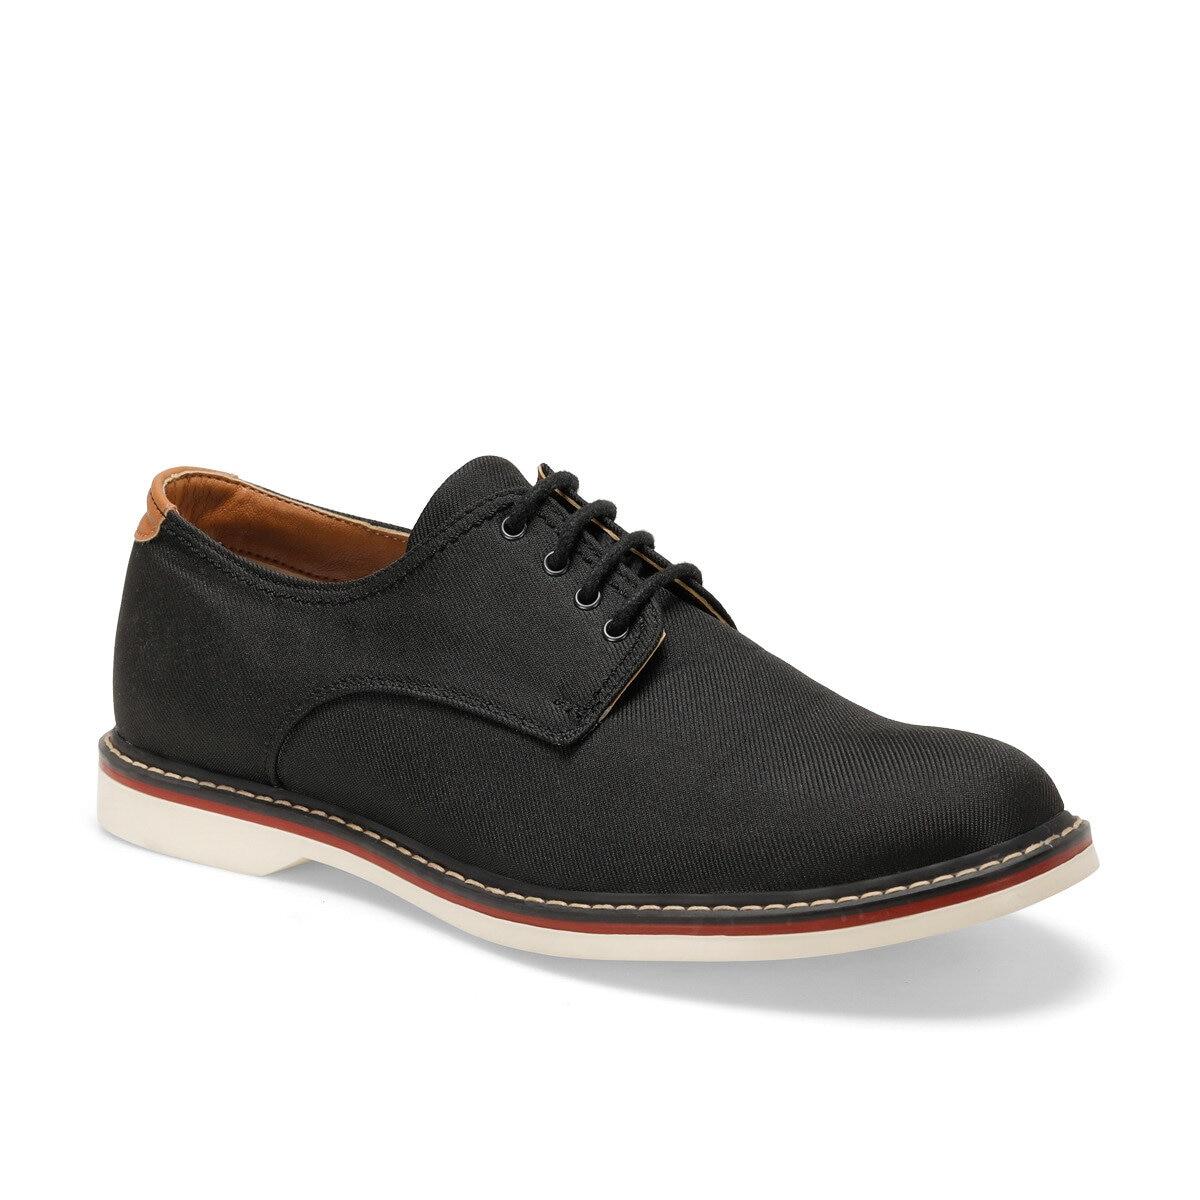 FLO 61120 Navy Blue Men 'S Dress Shoes-Styles